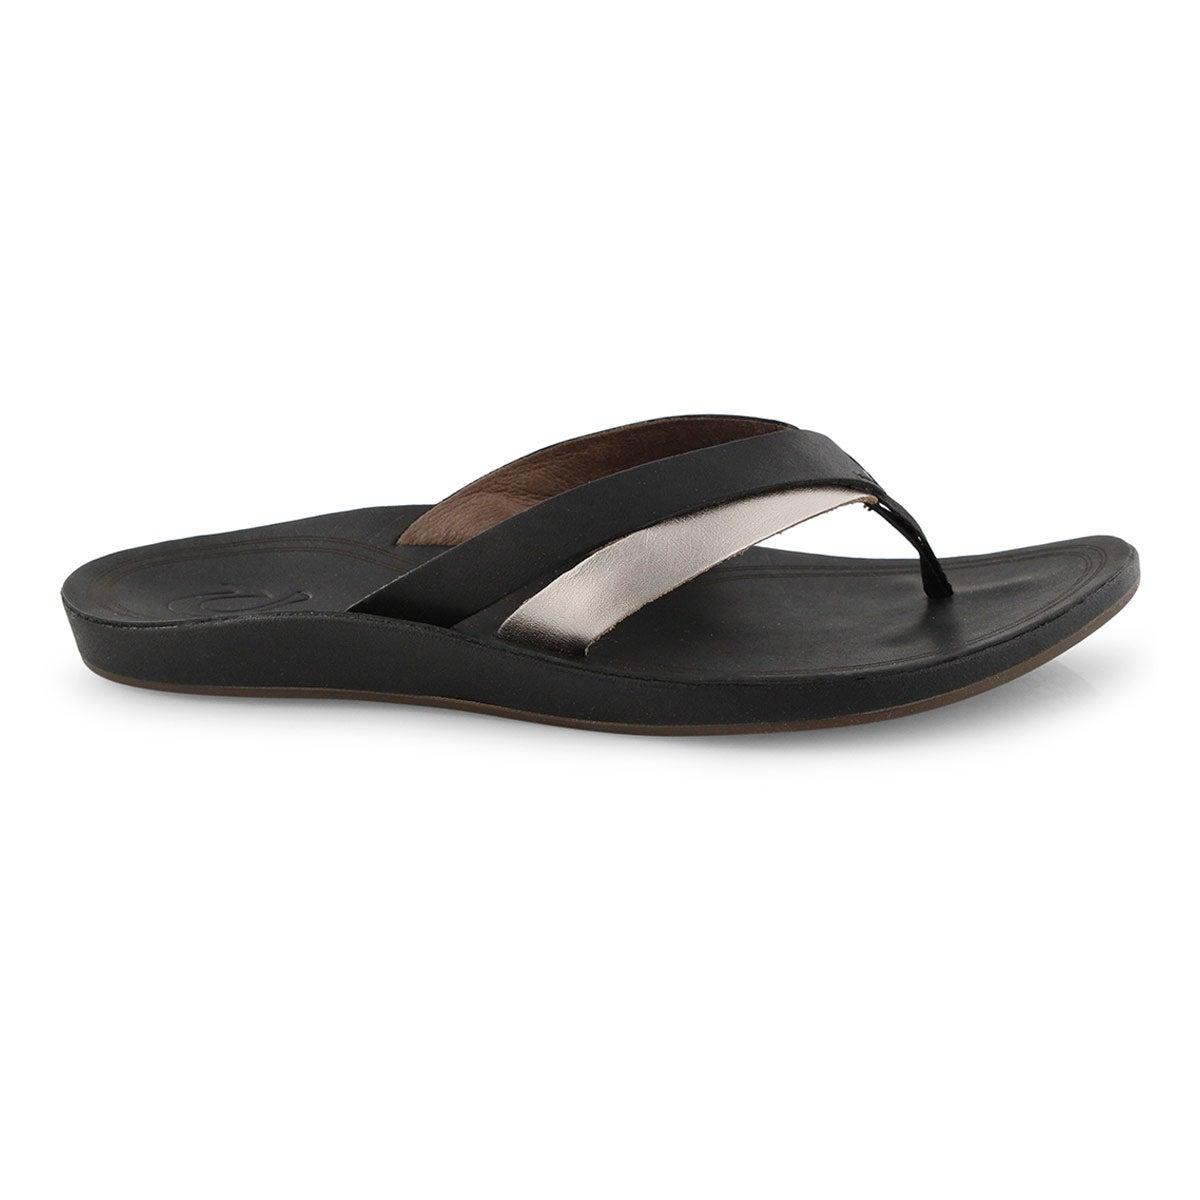 Lds KaeKae black/silver thong sandal